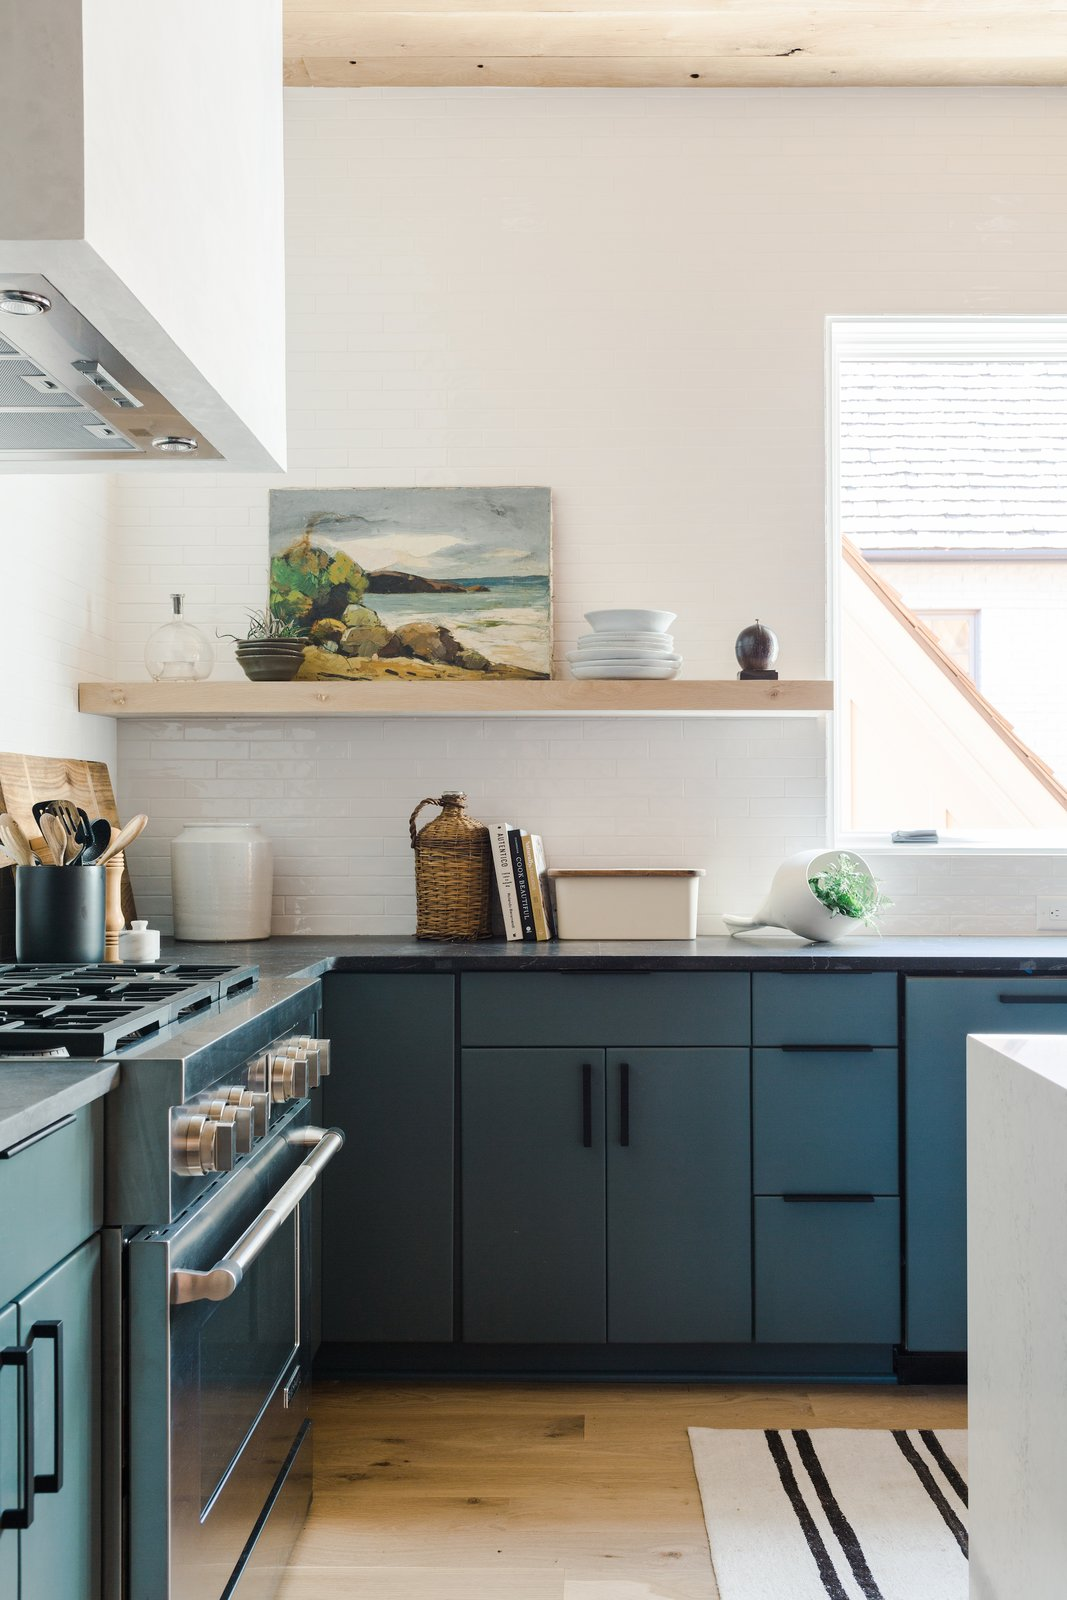 Naturally House kitchen open shelving